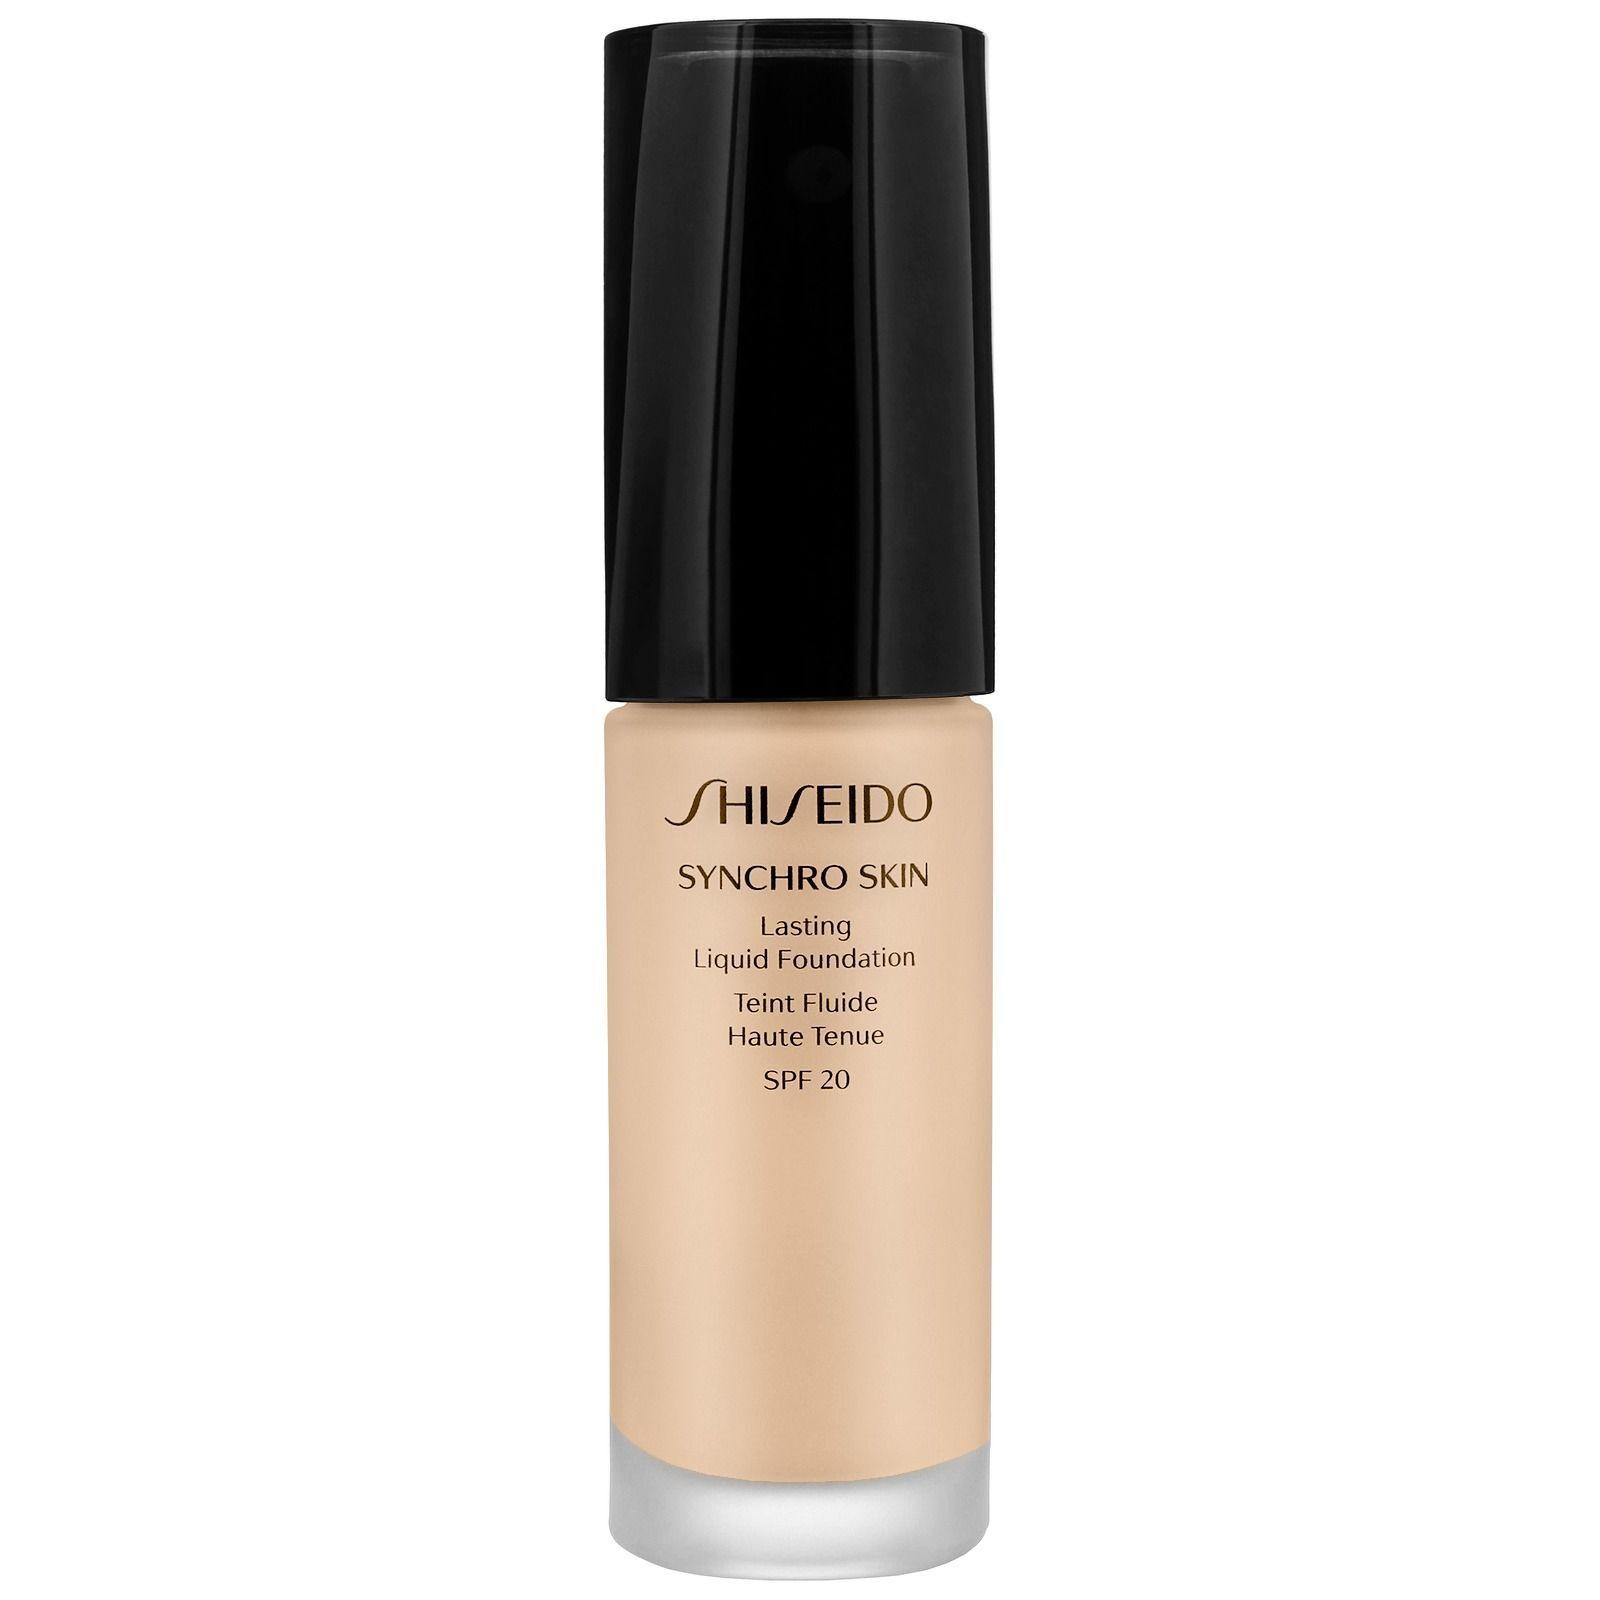 Shiseido Synchro Skin Lasting Liquid Foundation SPF20 Neutro 1 30ml / 1 oz.